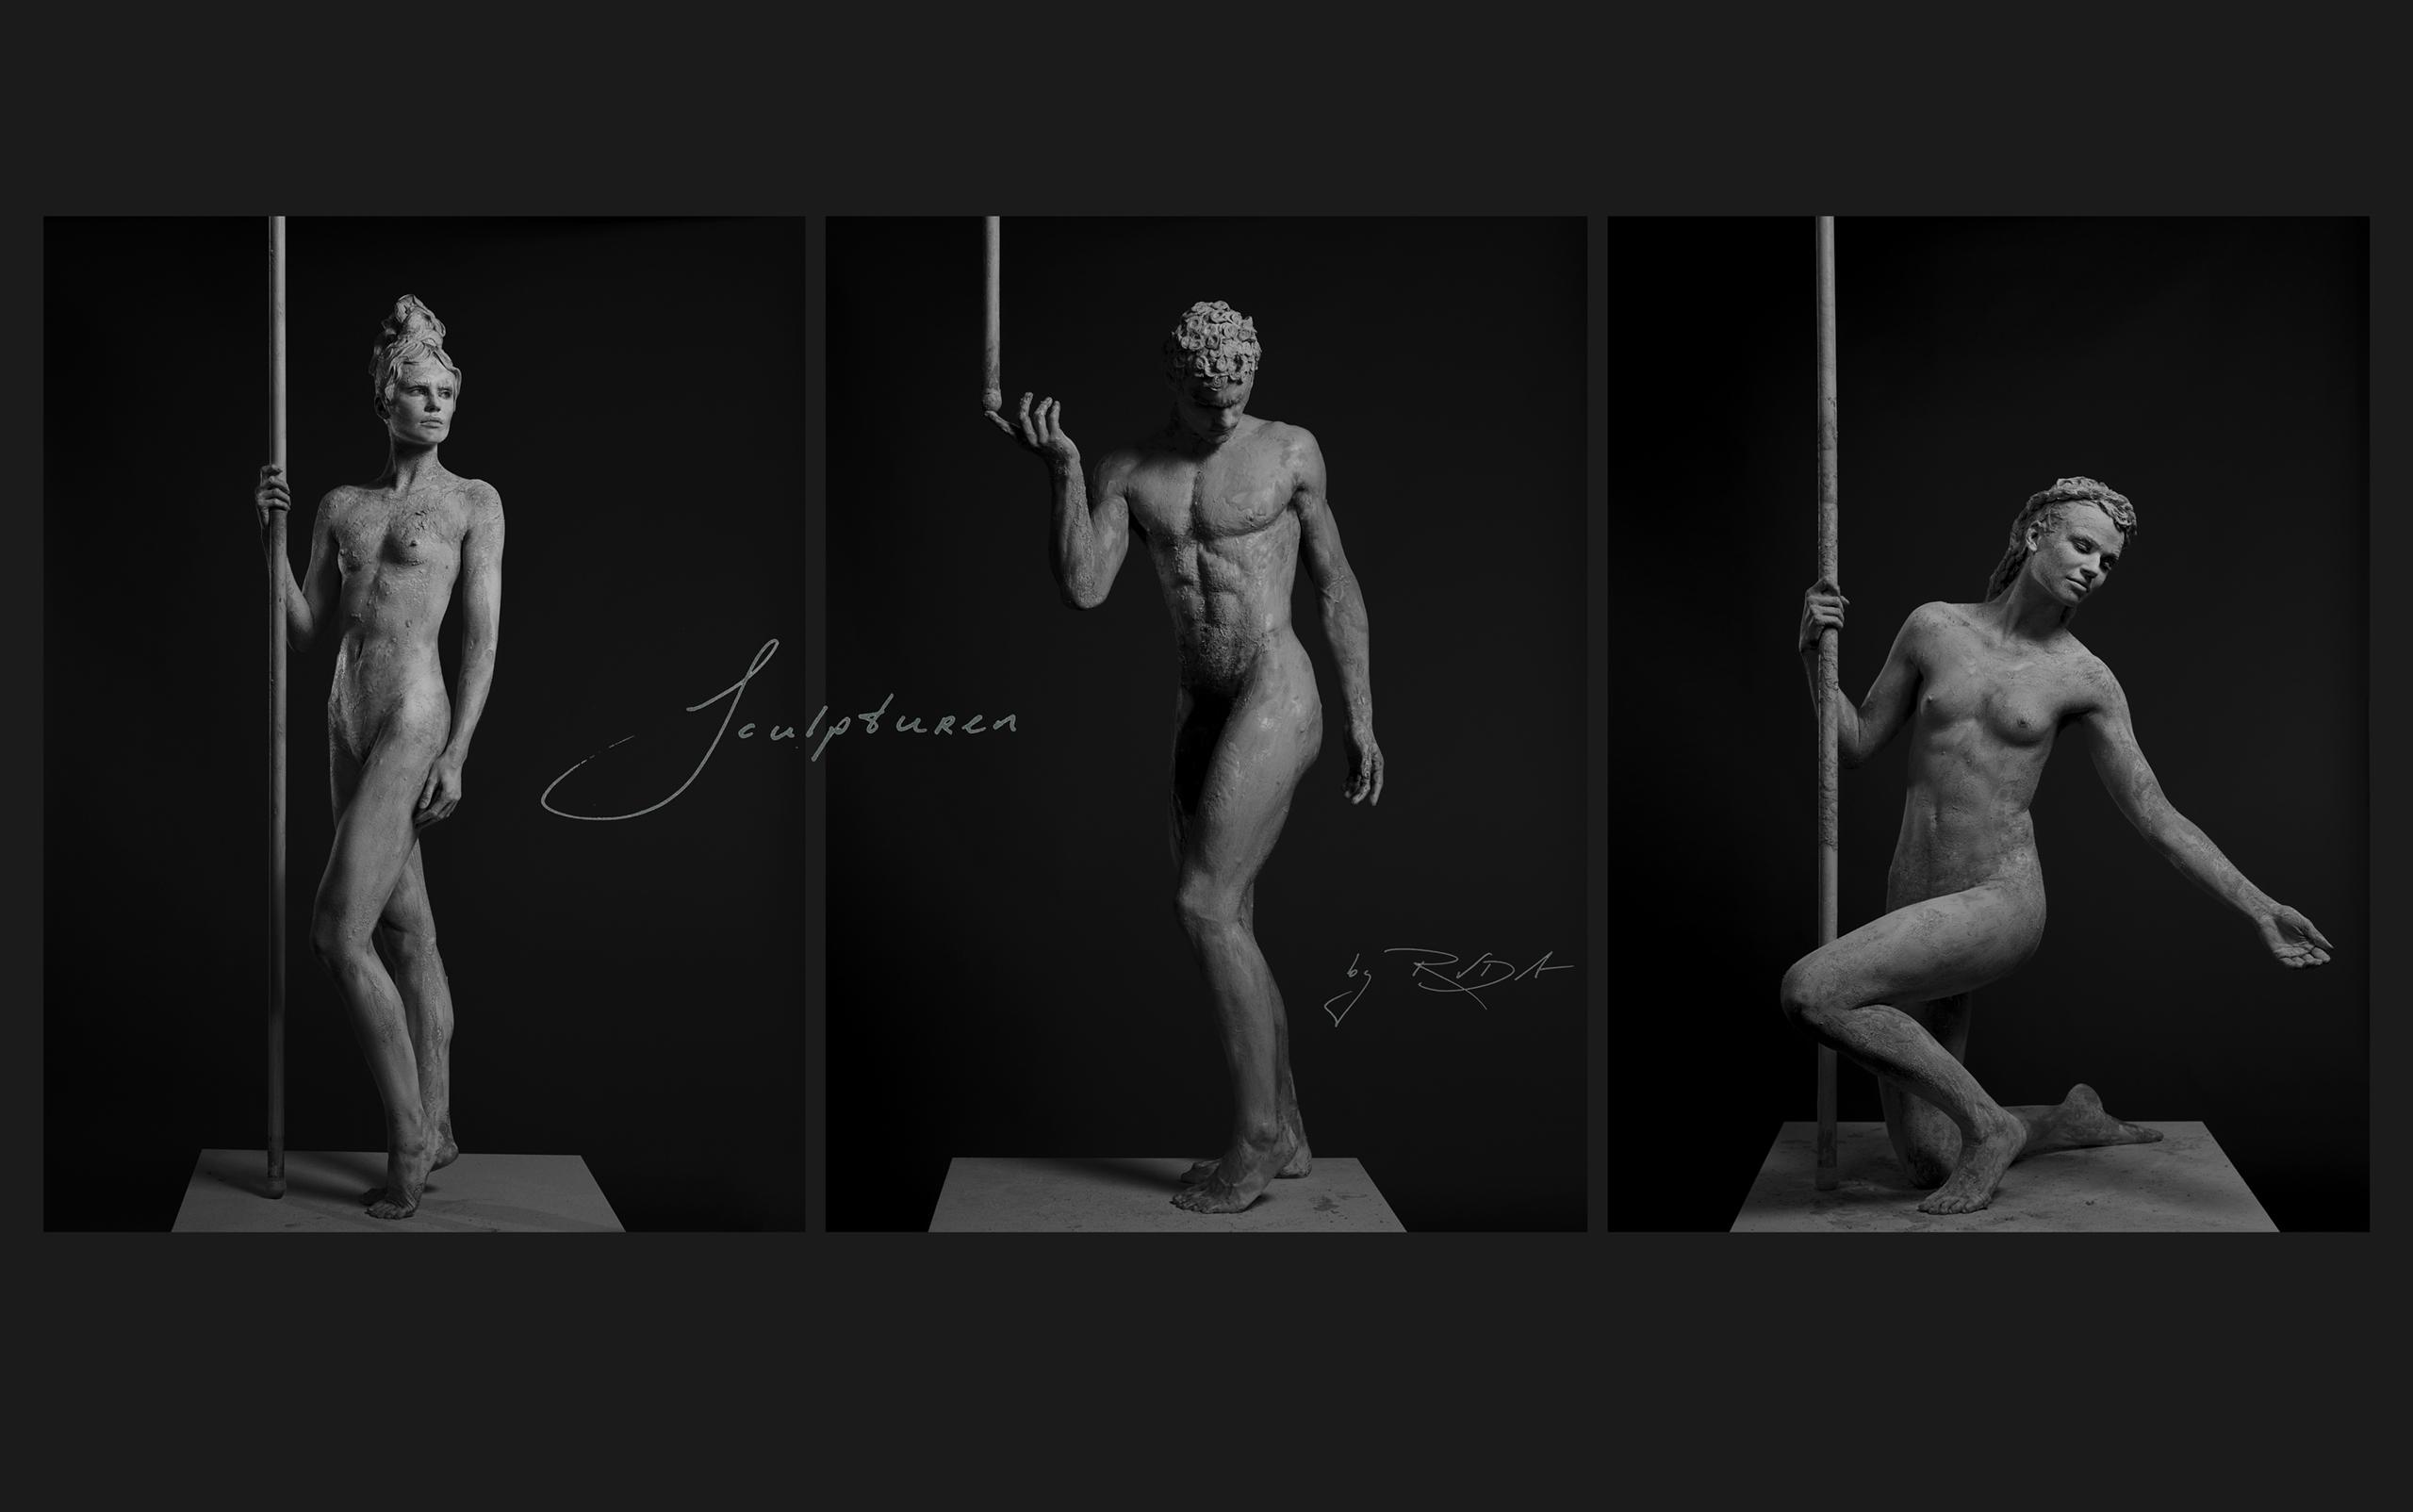 Sculptures-16-04-NCOI-by-RVDA-003-6335x-comp